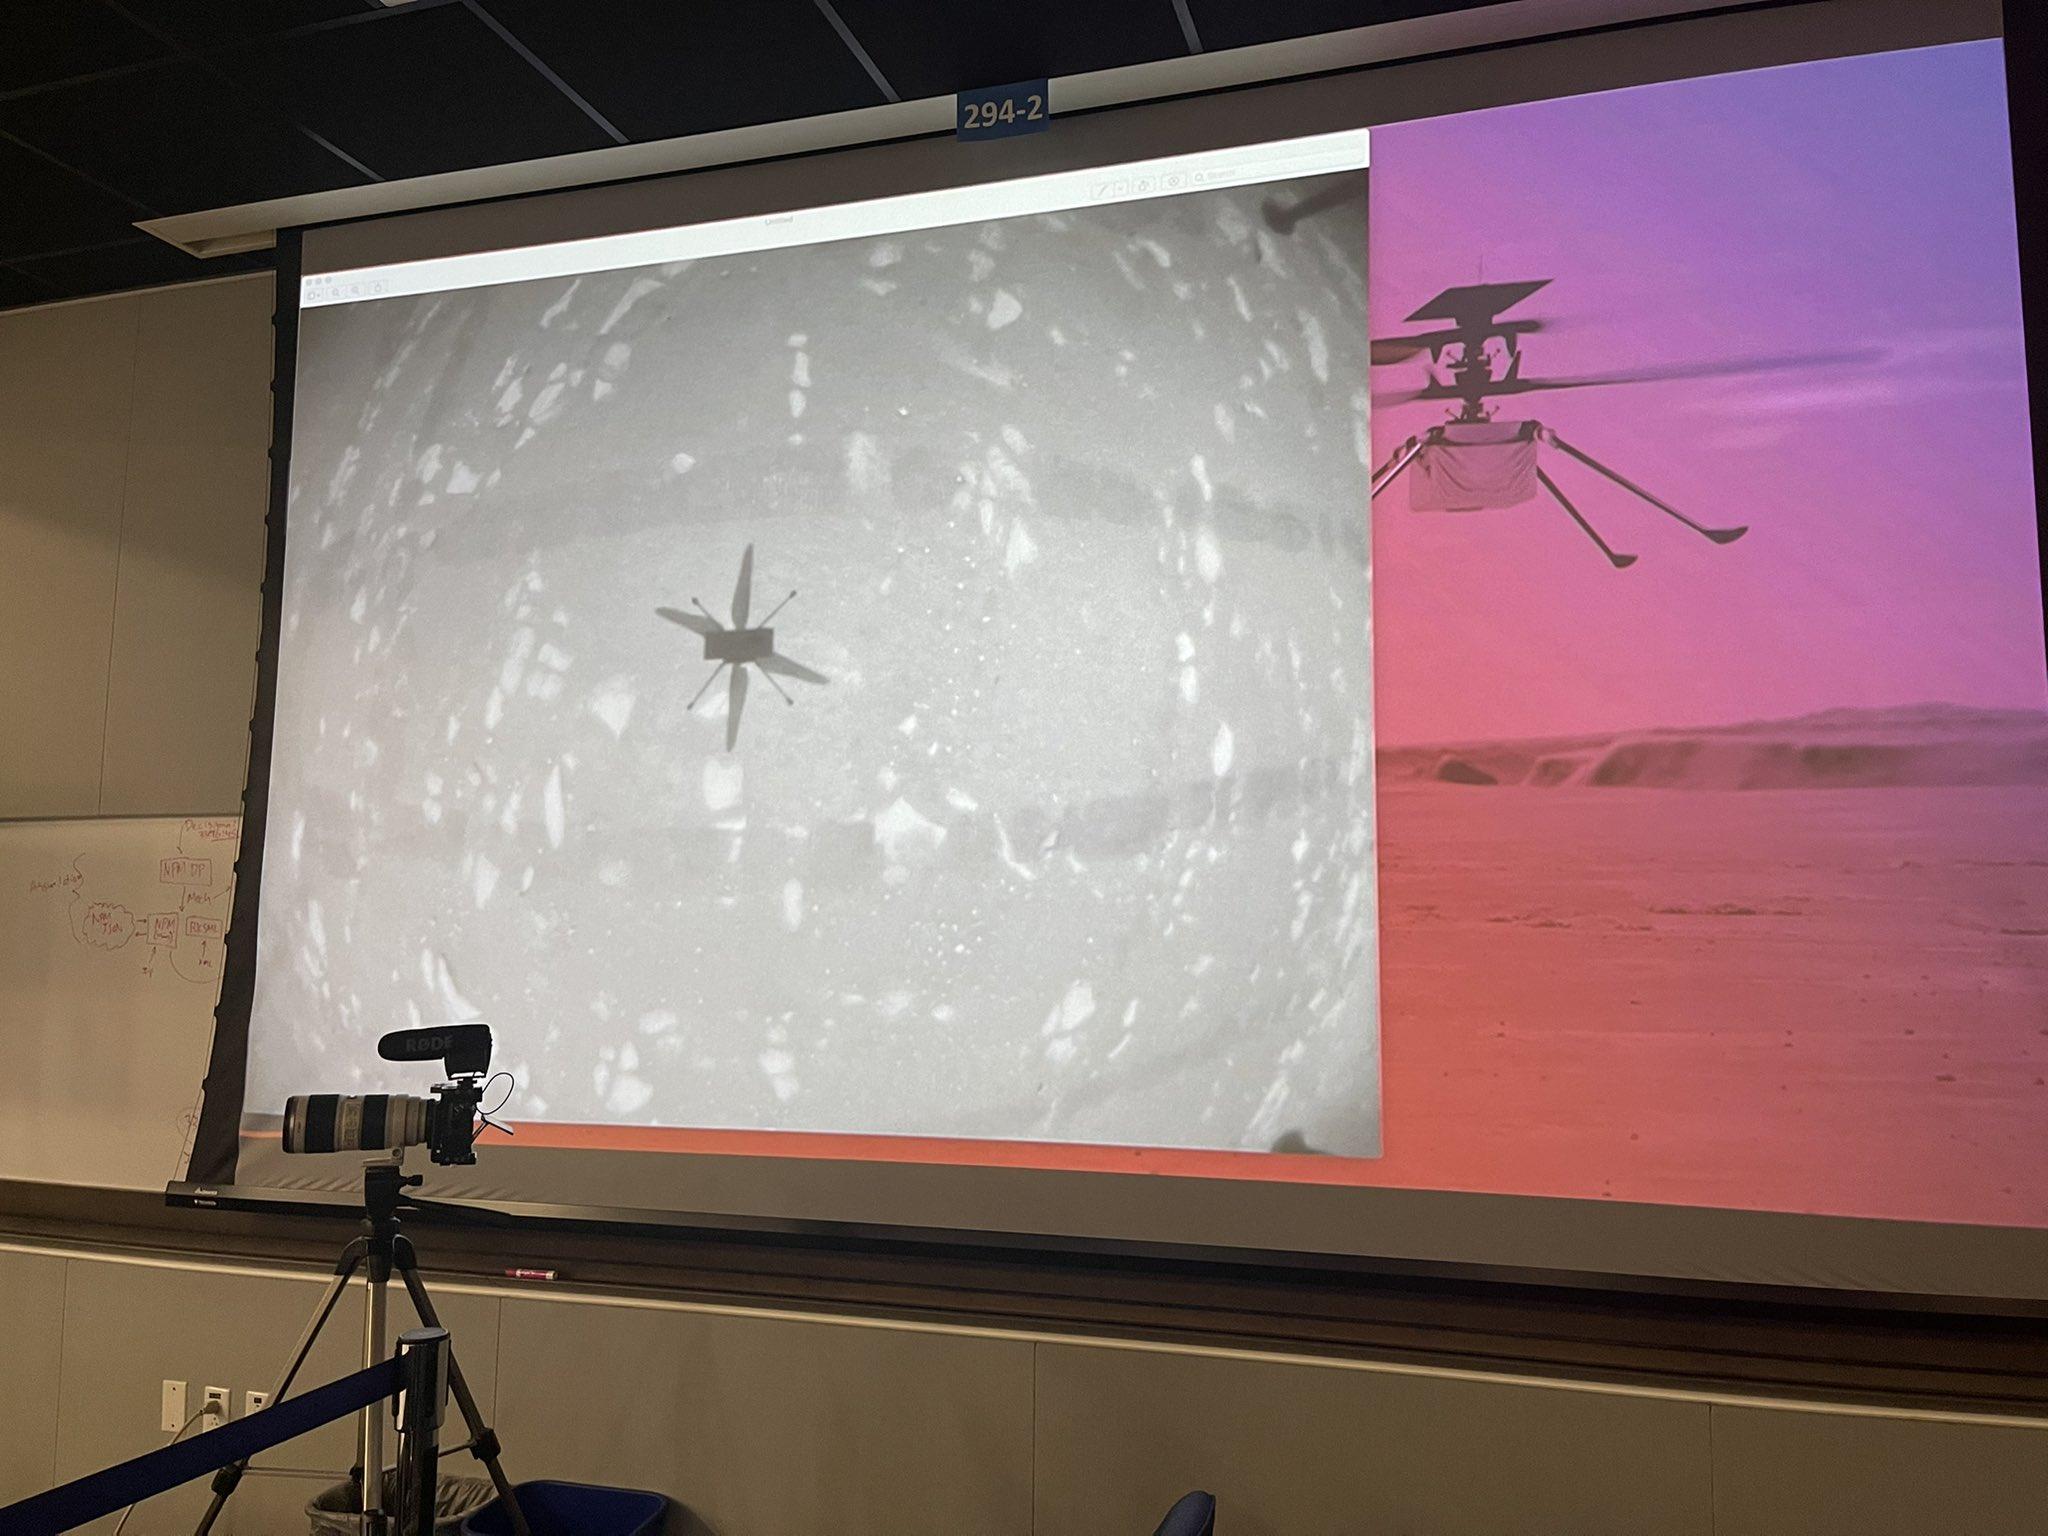 SON DAKİKA NASA Mars ta ilk kez helikopter uçurdu